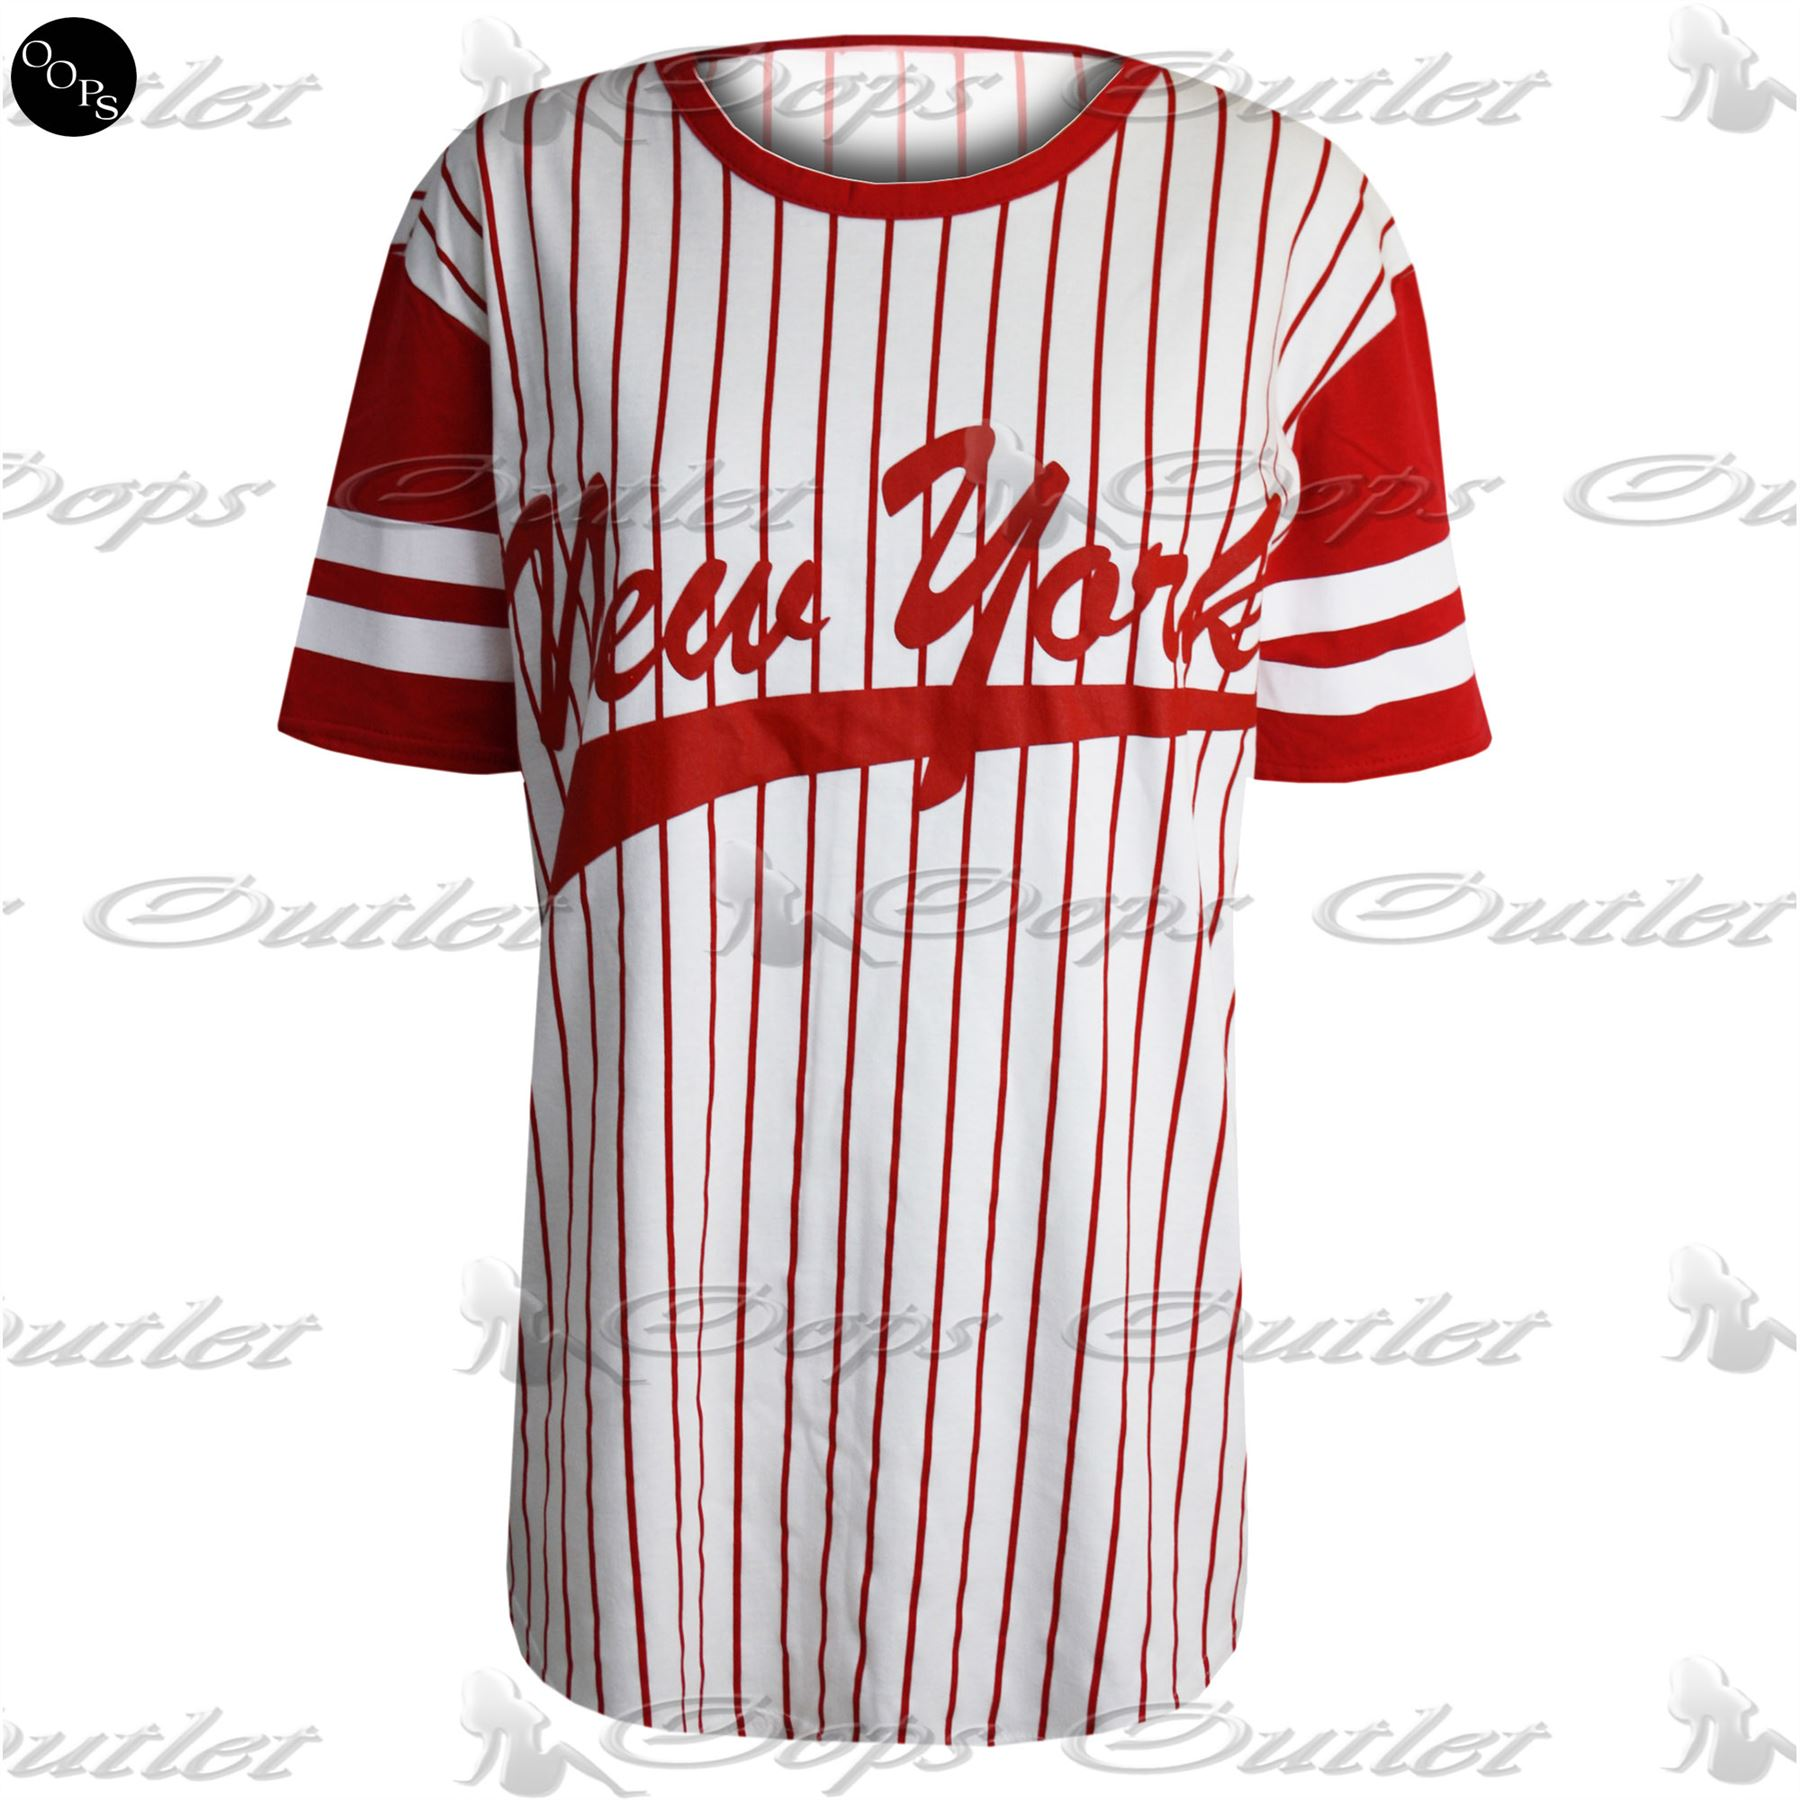 femme baggy jersey femmes new york rayures imprim varsity baseball t shirt top ebay. Black Bedroom Furniture Sets. Home Design Ideas